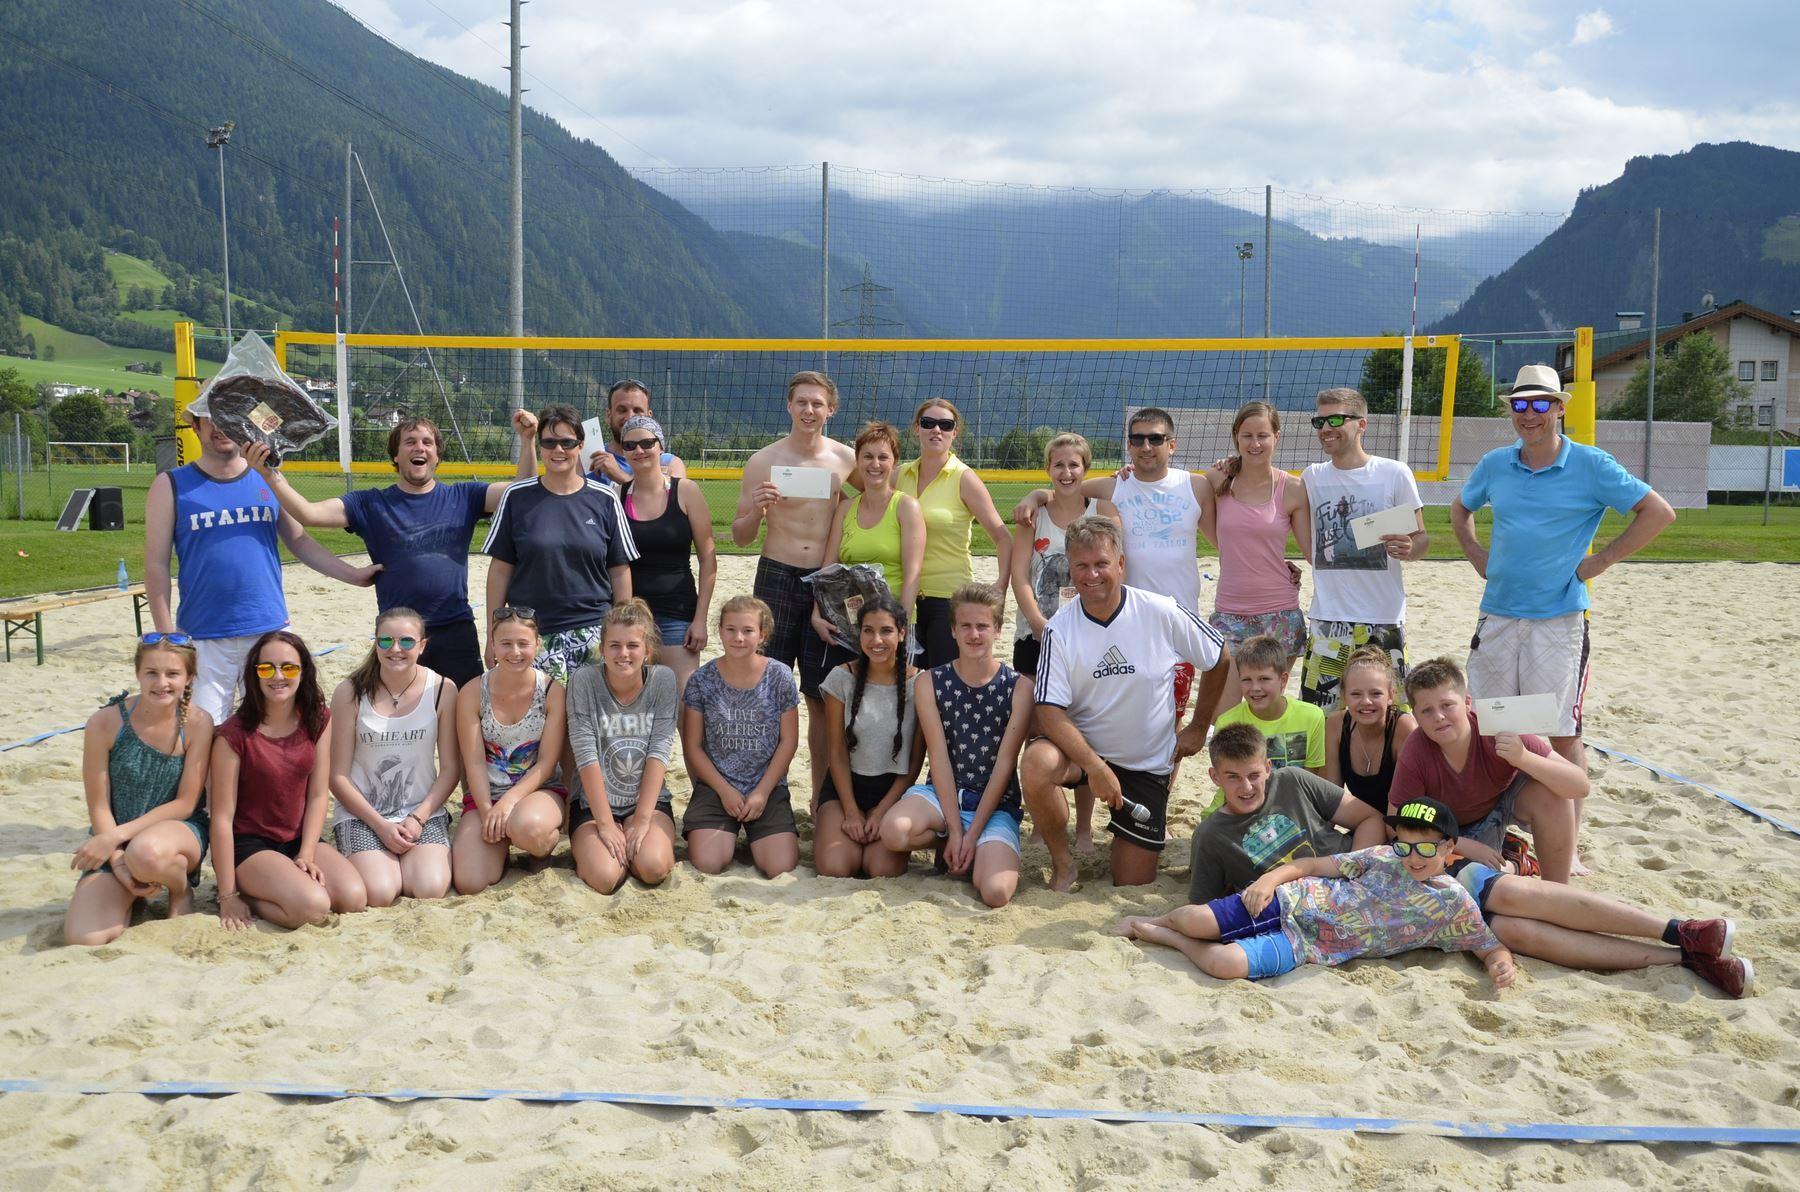 2016-07-02 Beachvolleyball 318